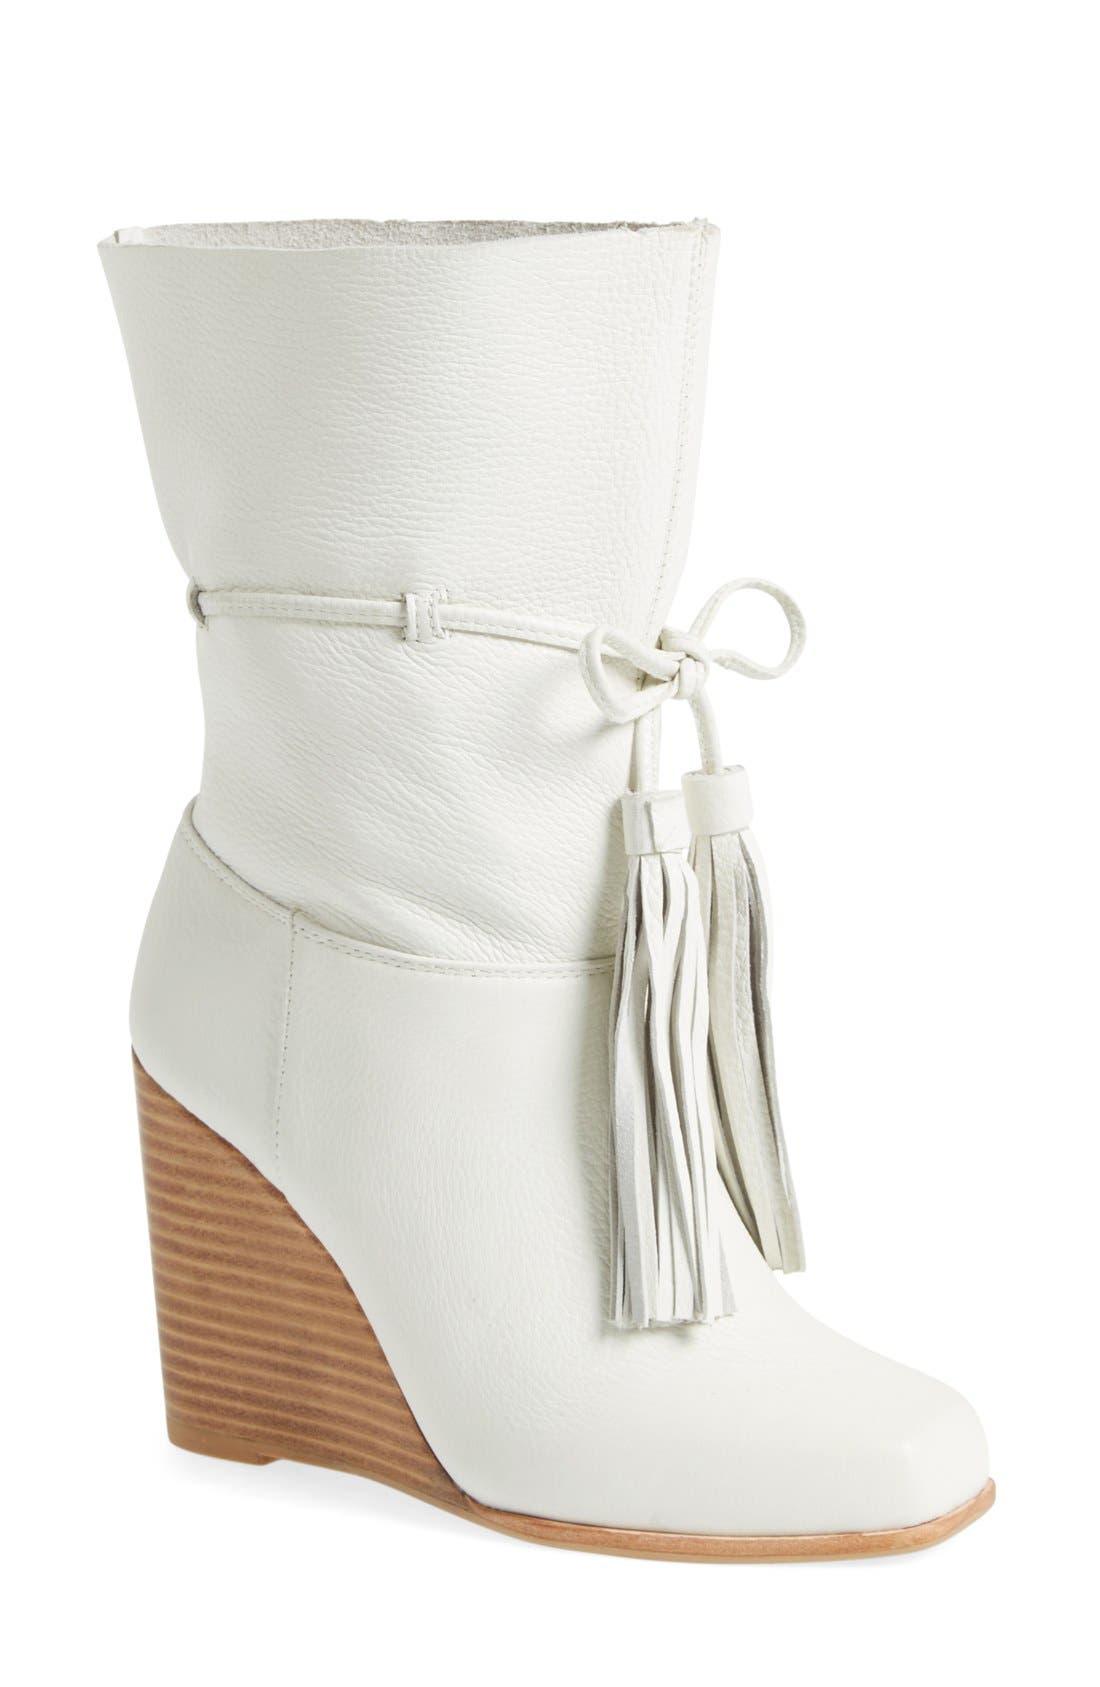 Alternate Image 1 Selected - Jeffrey Campbell 'Larusso' Wedge Tassel Boot (Women)